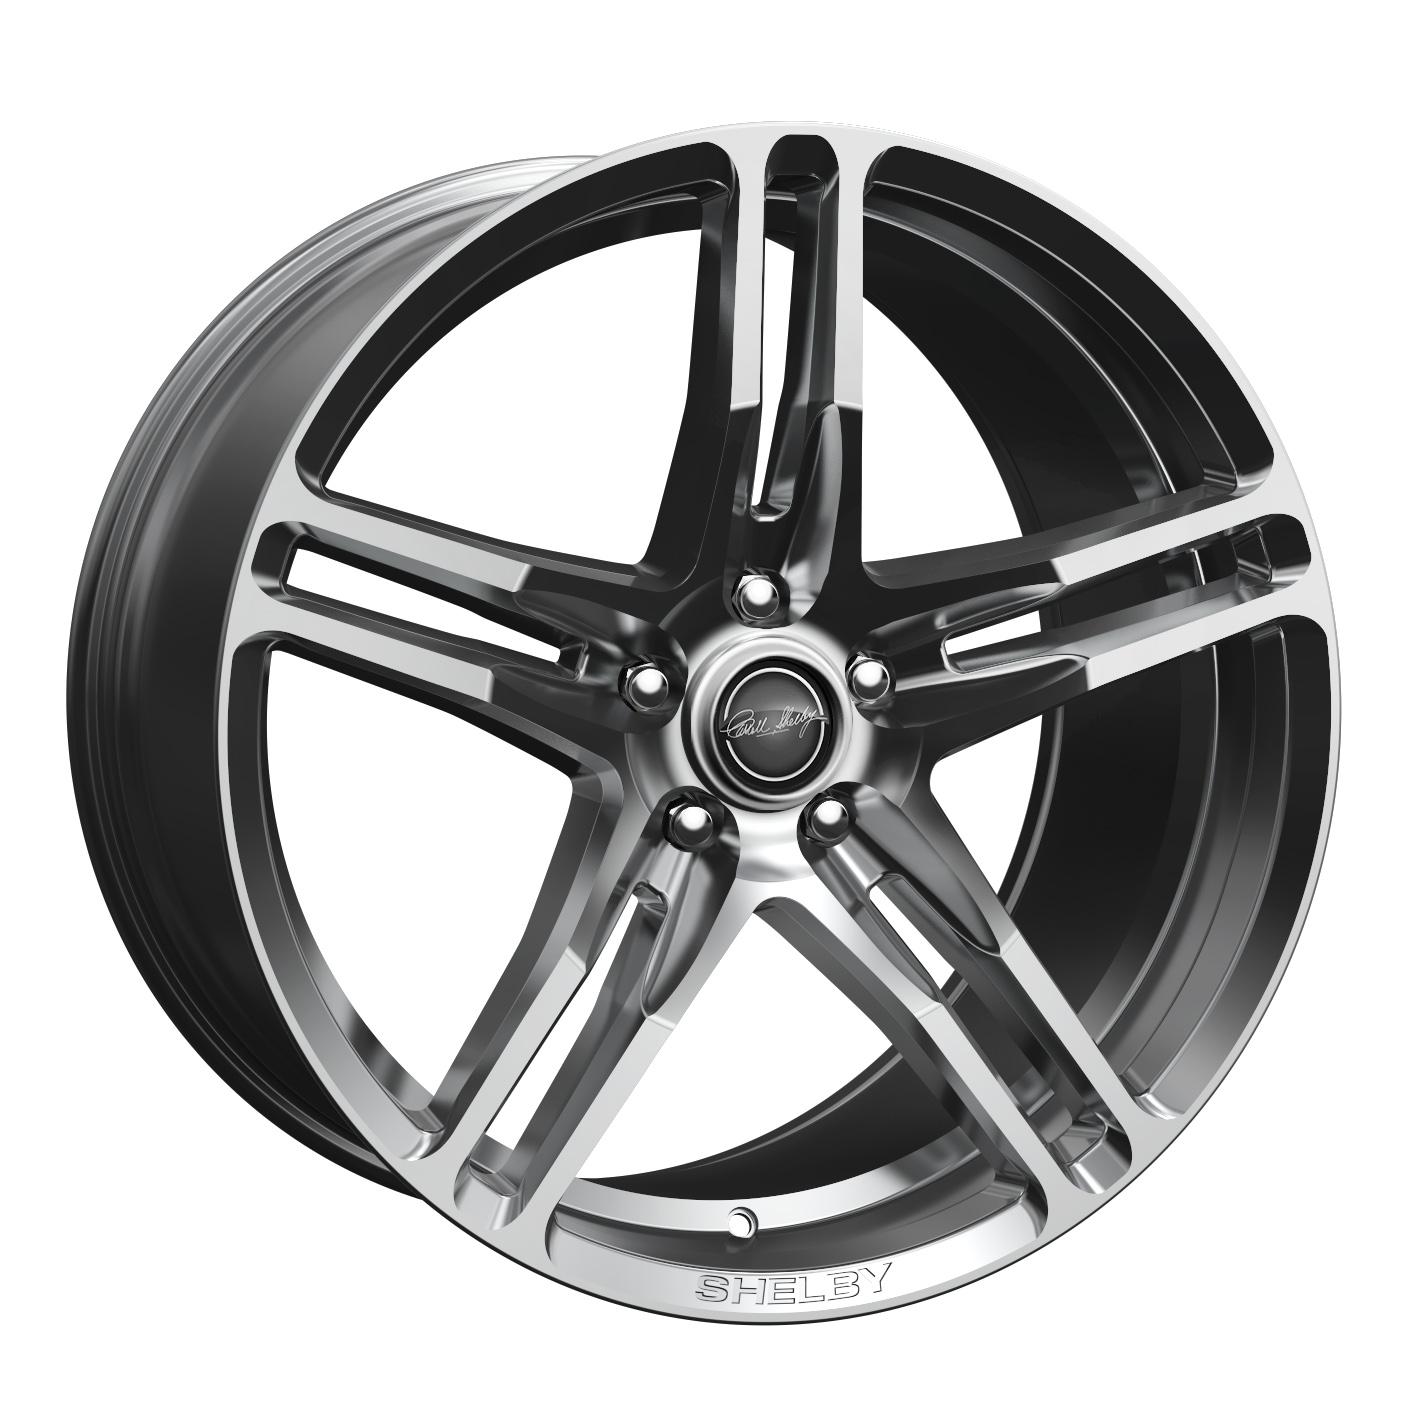 Carroll Shelby Wheels CS 14 - Chrome Powder (Hyper Silver) Rim